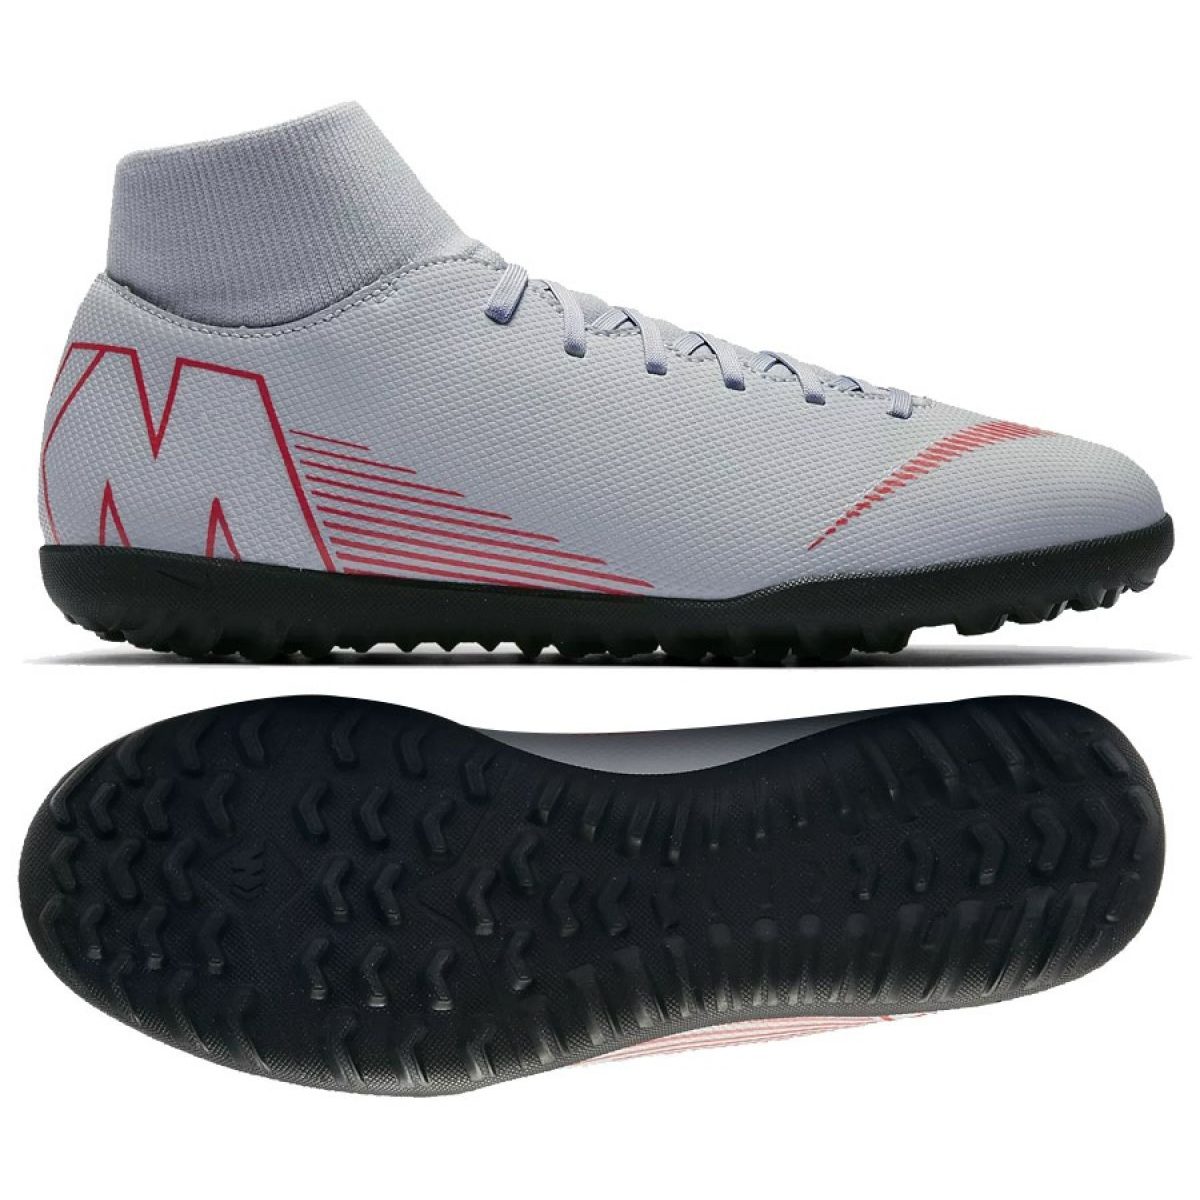 best loved 3c6c1 f02ed Nike Mercurial SuperflyX 6 Club Tf M AH7372-060 Football Shoes